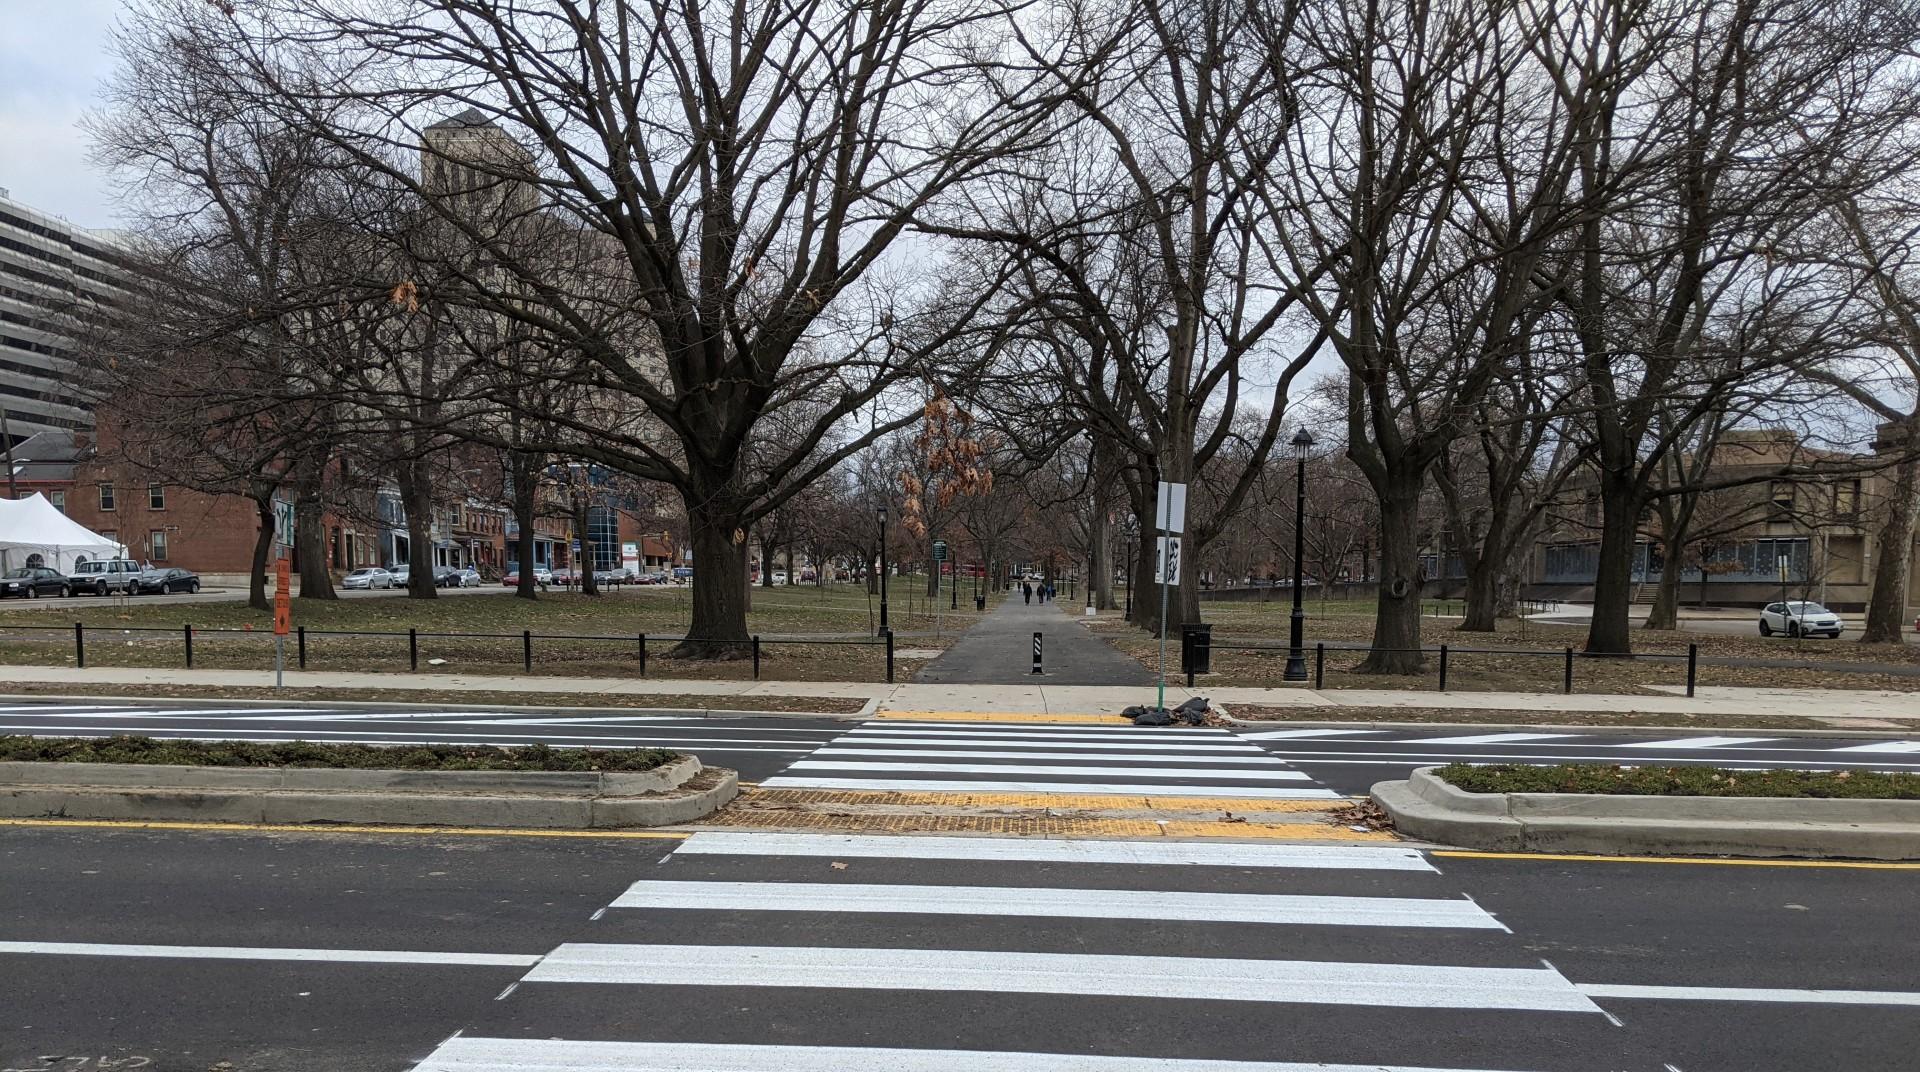 A pedestrian crosswalk in Allegheny Commons Park.